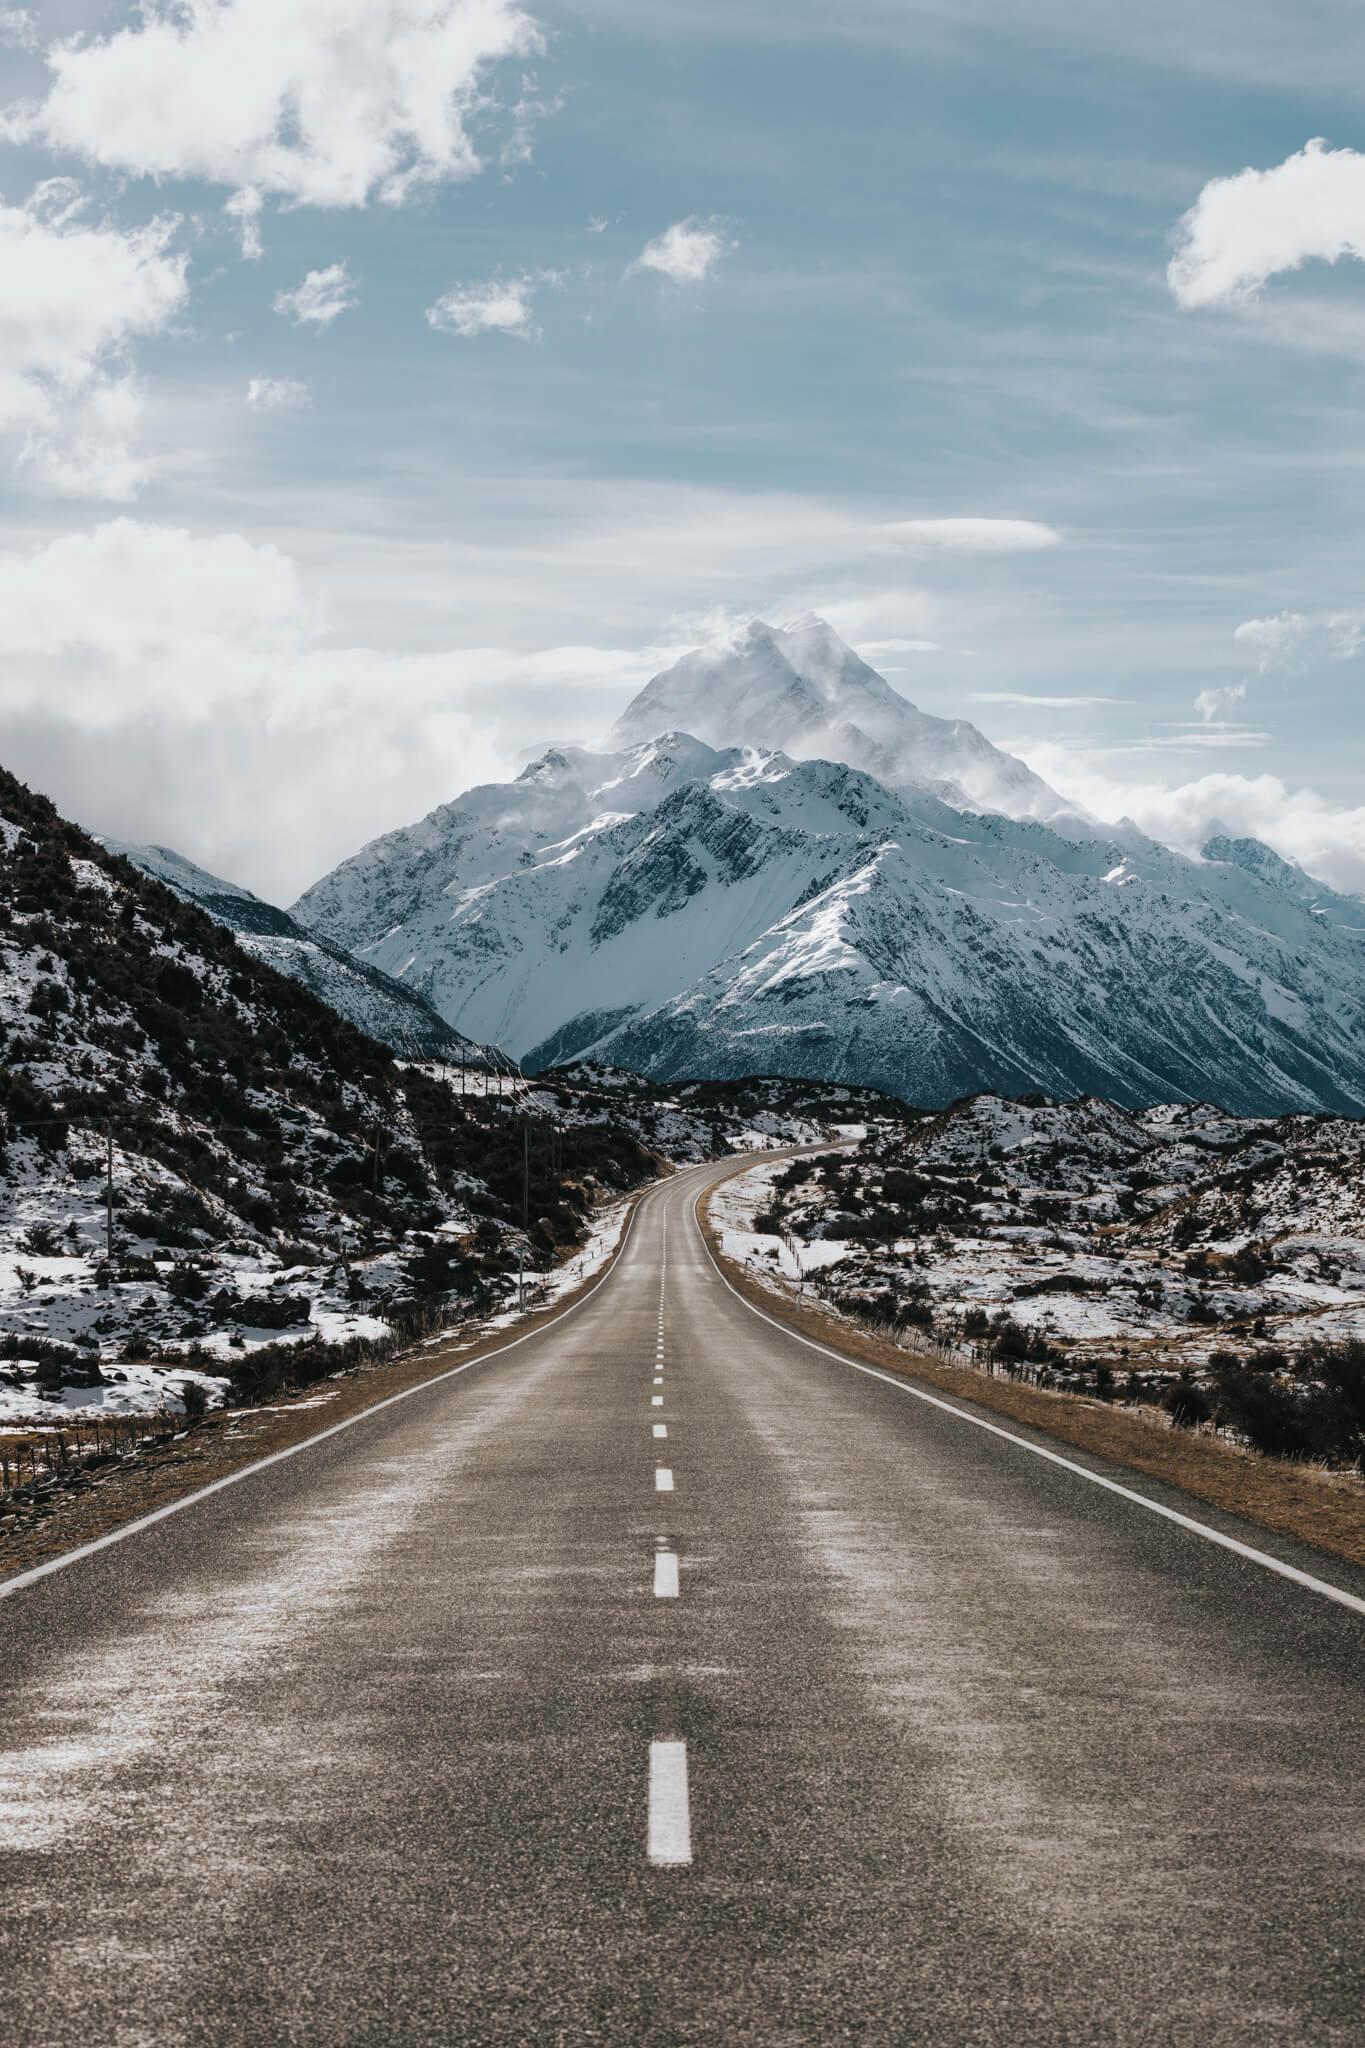 New-Zealand-Travel-Photography-Natalie-Skoric-26.jpg